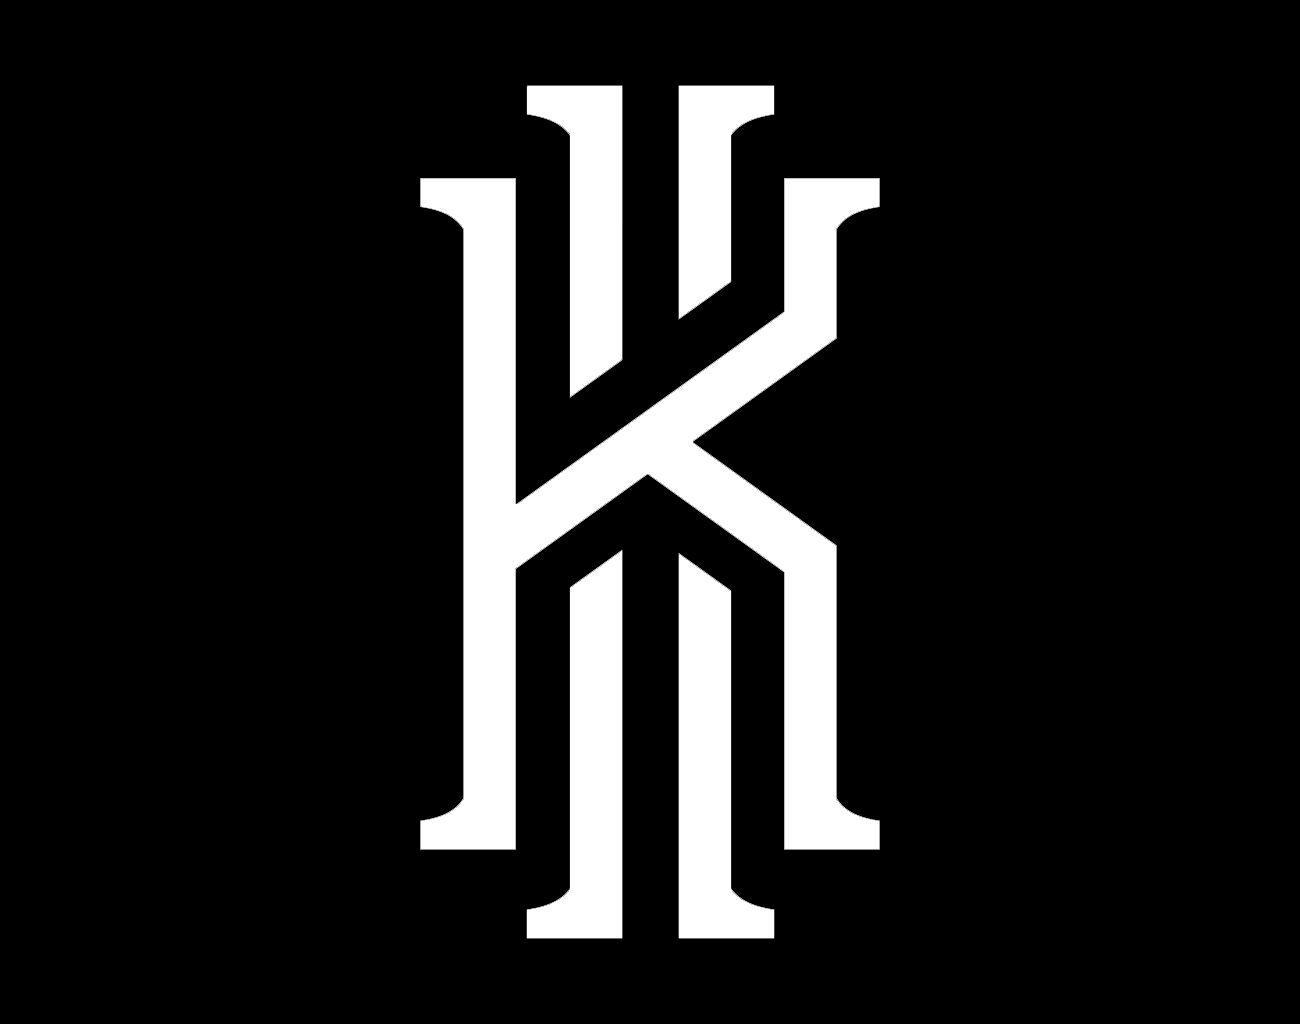 Symbol Kyrie Irving.